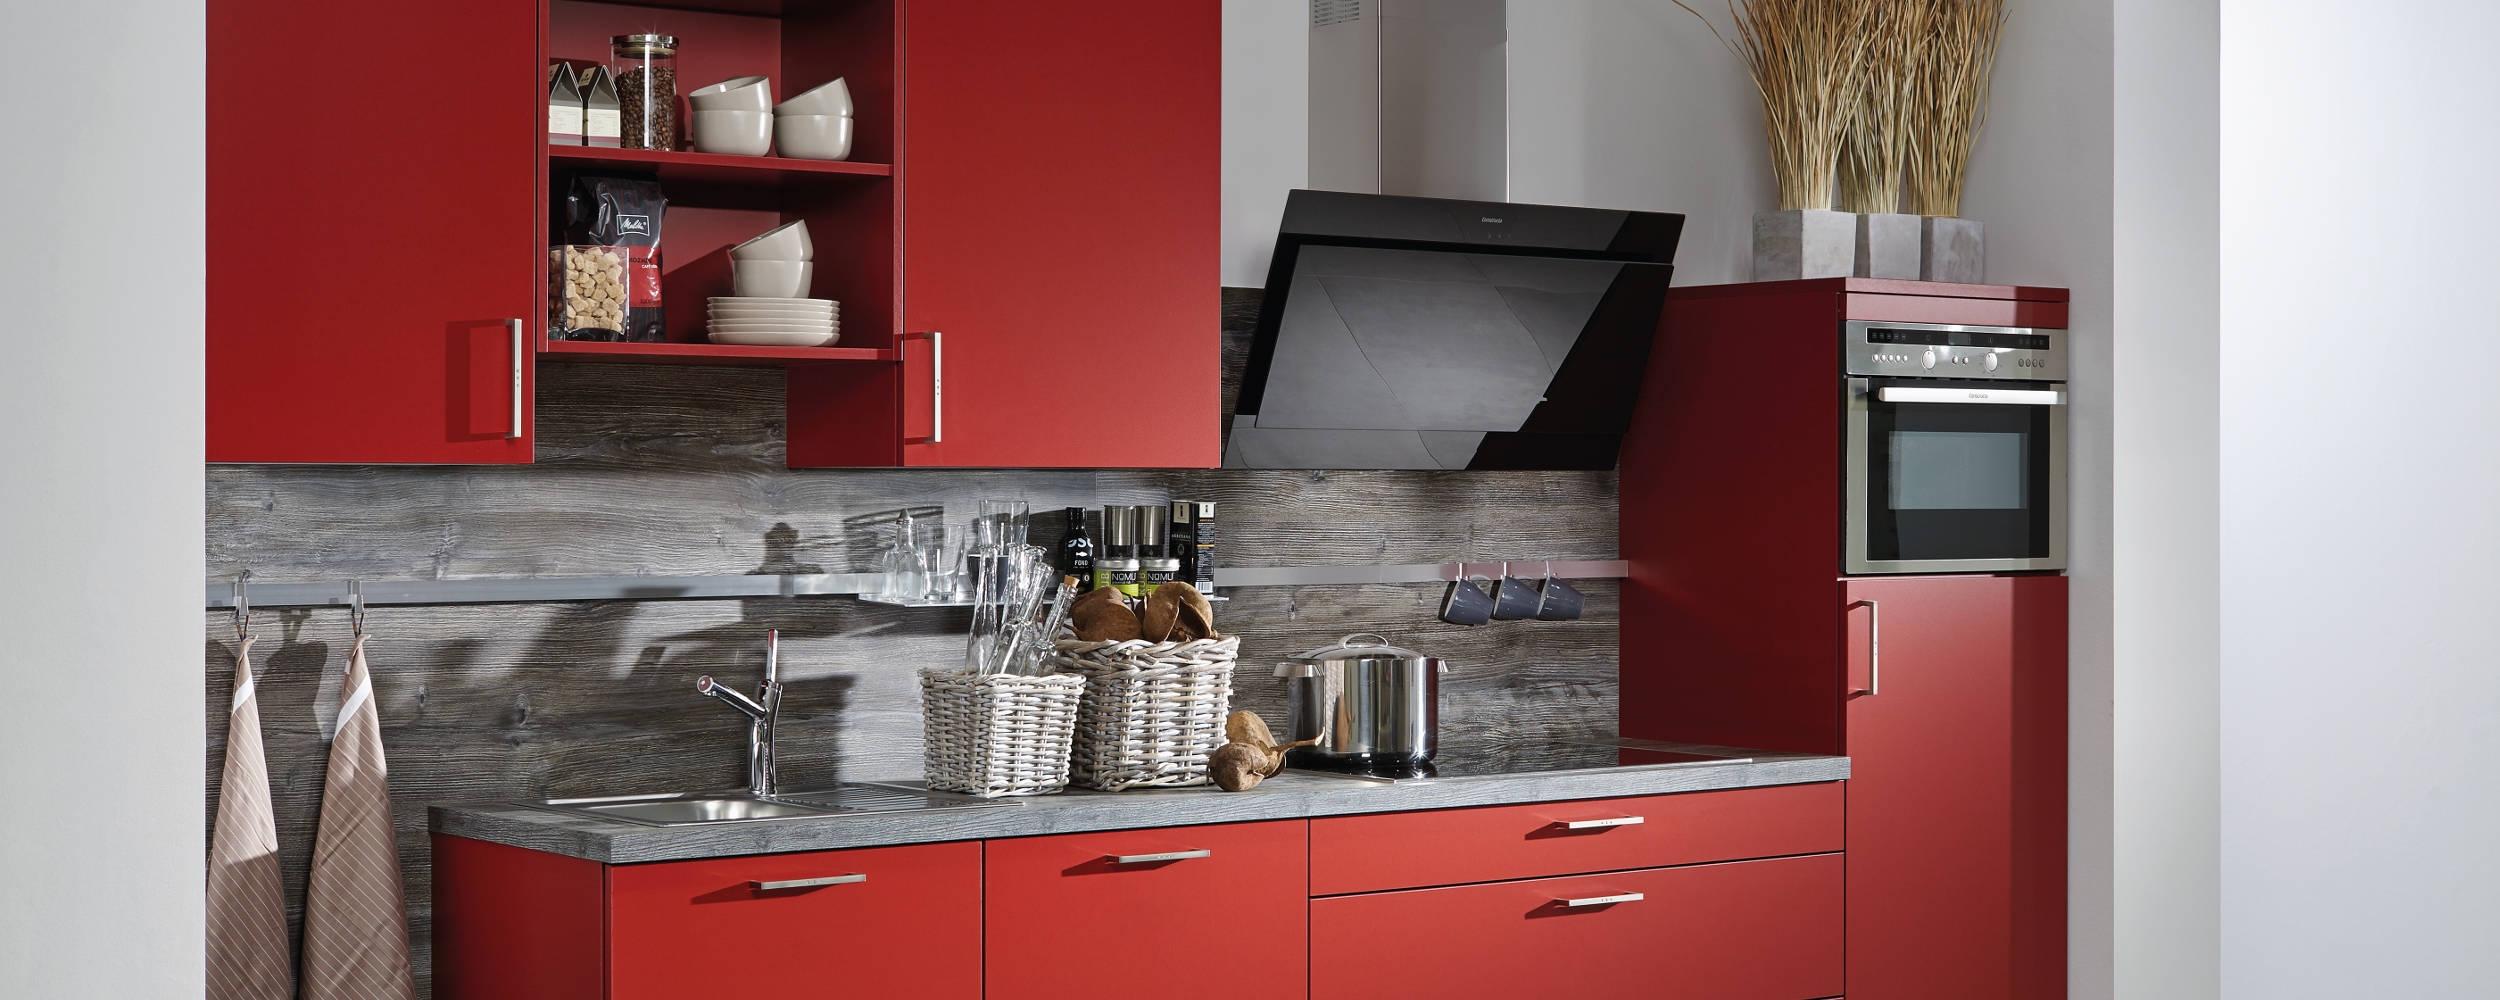 pronorm classic line kitchen edinburgh